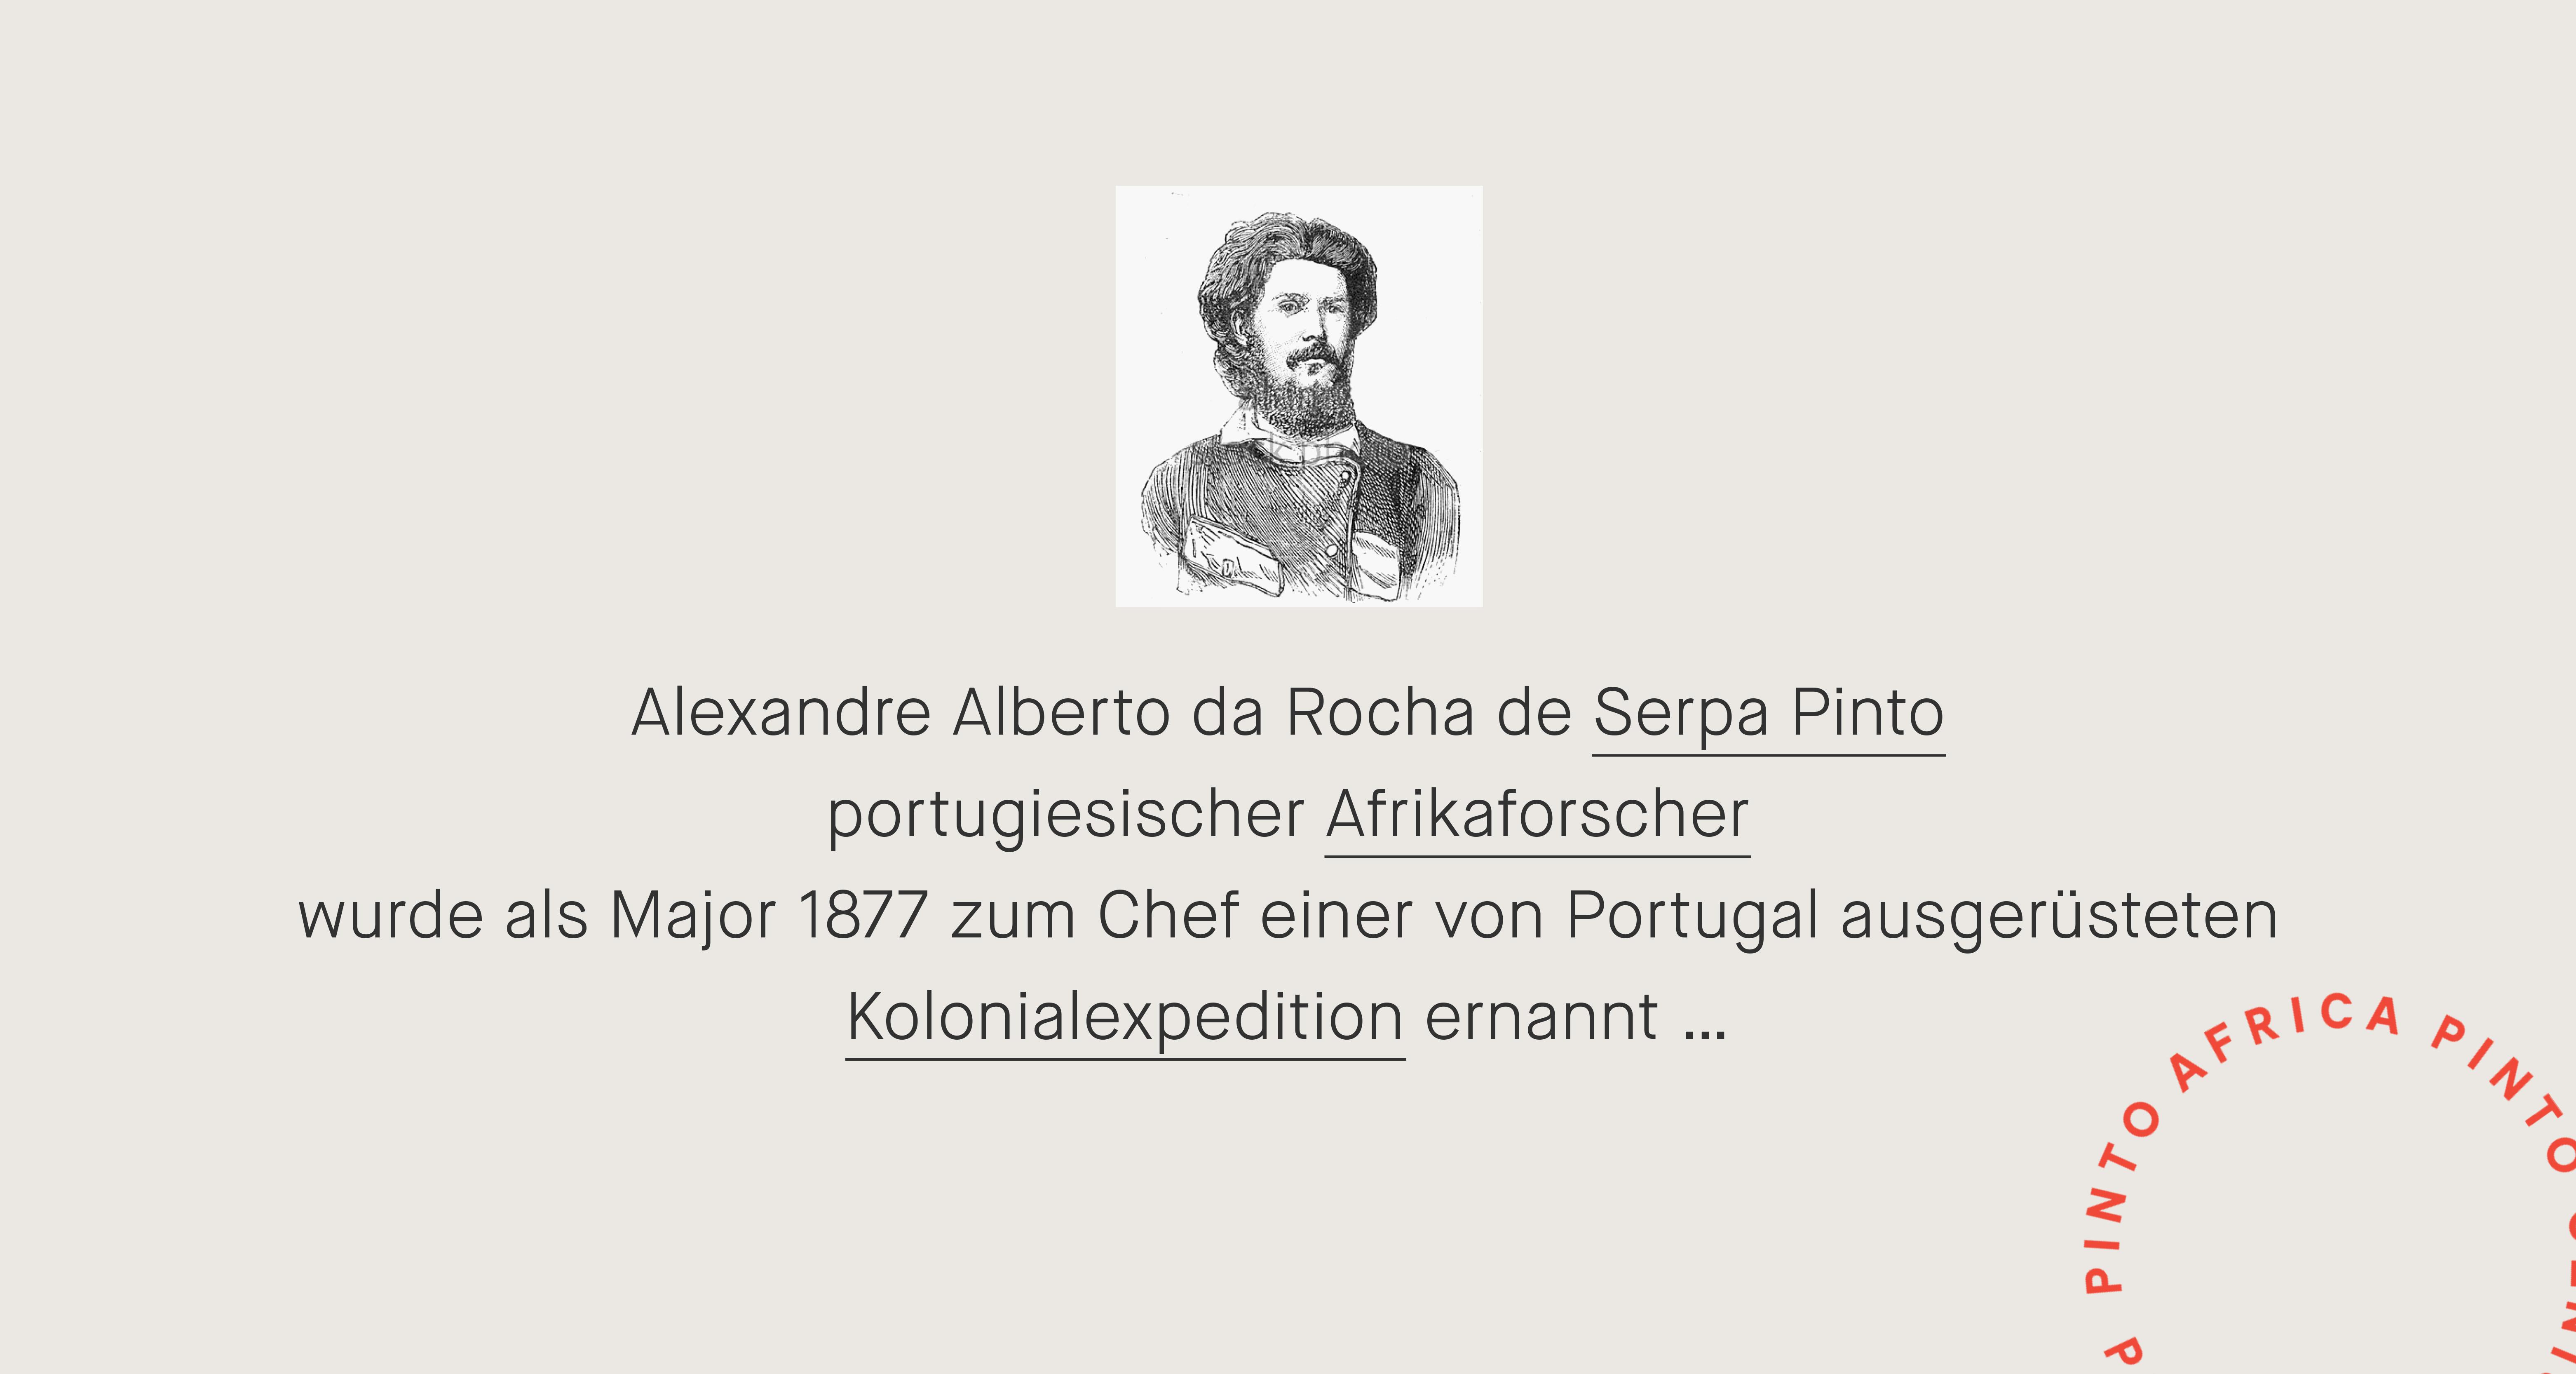 Serpa Pinto